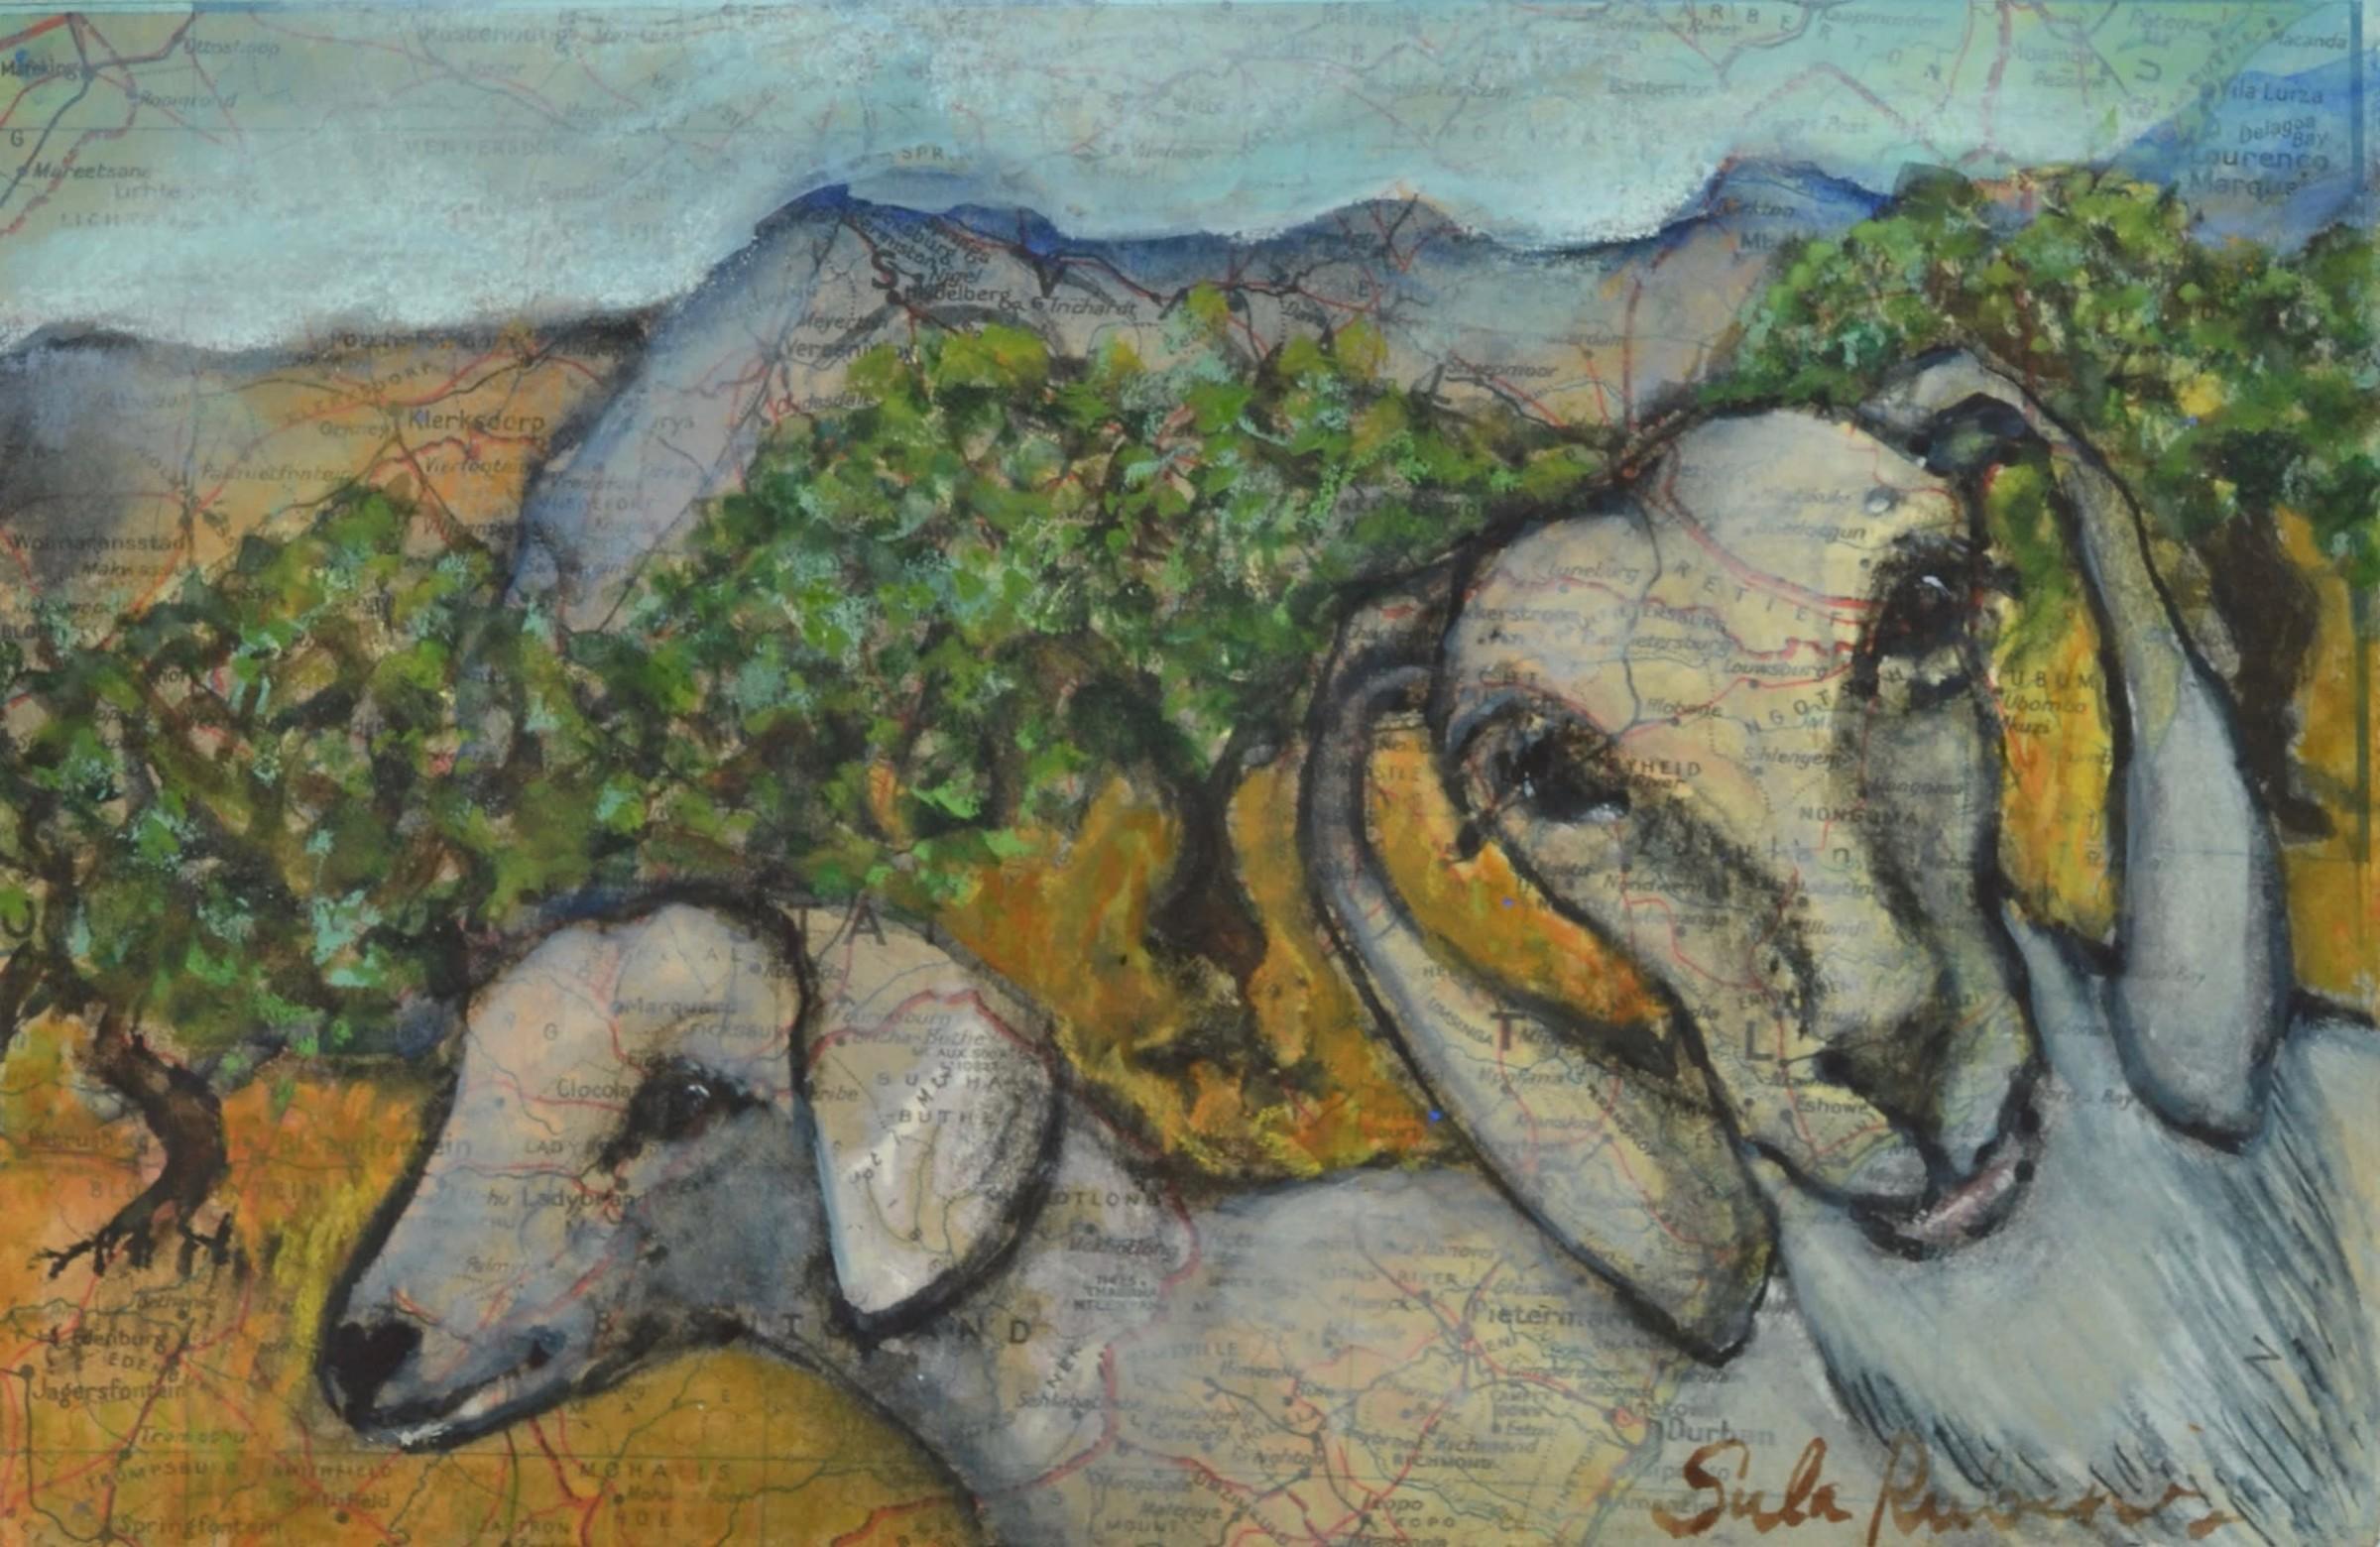 "<span class=""link fancybox-details-link""><a href=""/artists/212-sula-rubens/works/12850-sula-rubens-two-young-goats-study/"">View Detail Page</a></span><div class=""artist""><span class=""artist""><strong>Sula Rubens</strong></span></div><div class=""title""><em>Two Young Goats Study</em></div><div class=""medium"">watercolour on map paper</div><div class=""dimensions"">Frame: 31 x 35.5cm<br /> Artwork: 12 x 18cm</div><div class=""price"">£295.00</div>"